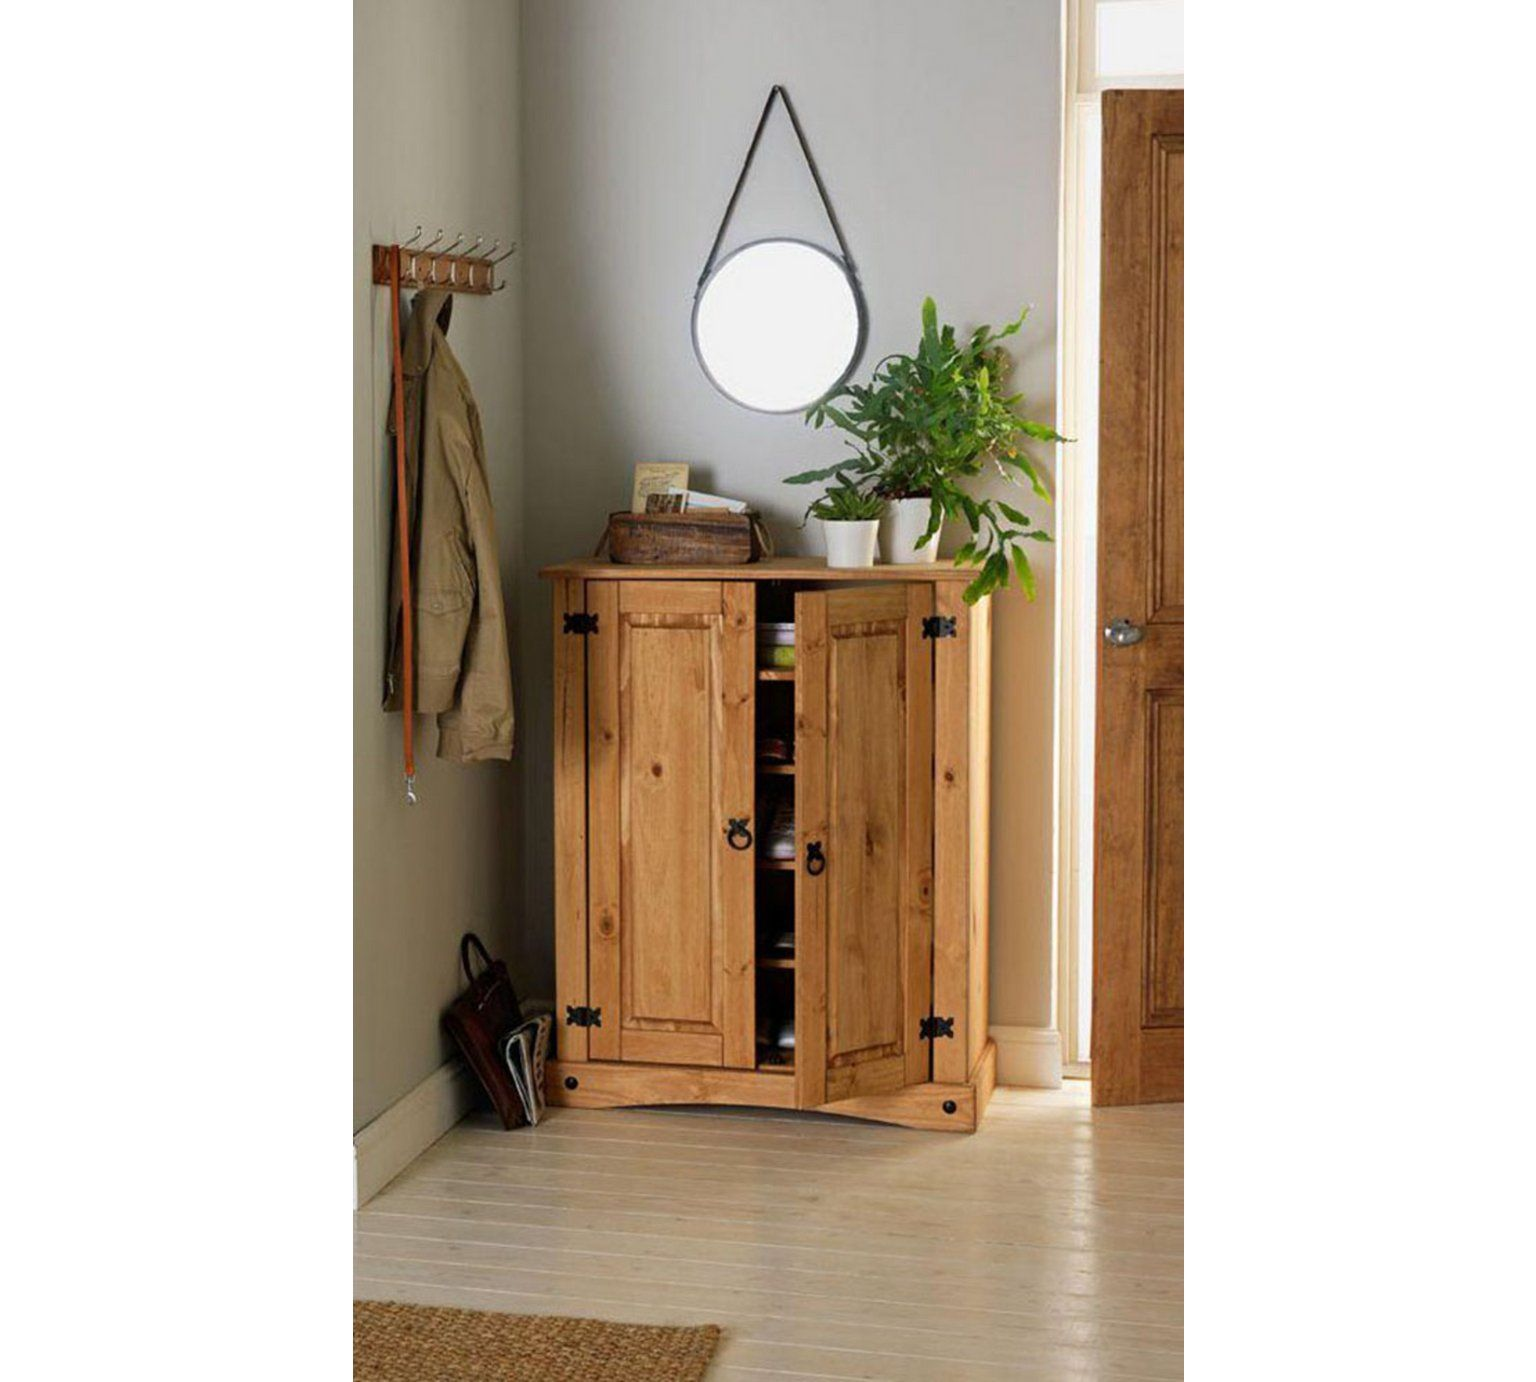 shoe storage hallway furniture. Buy Collection Puerto Rico Shoe Storage Cabinet - Antique Pine At Argos.co.uk Hallway Furniture G